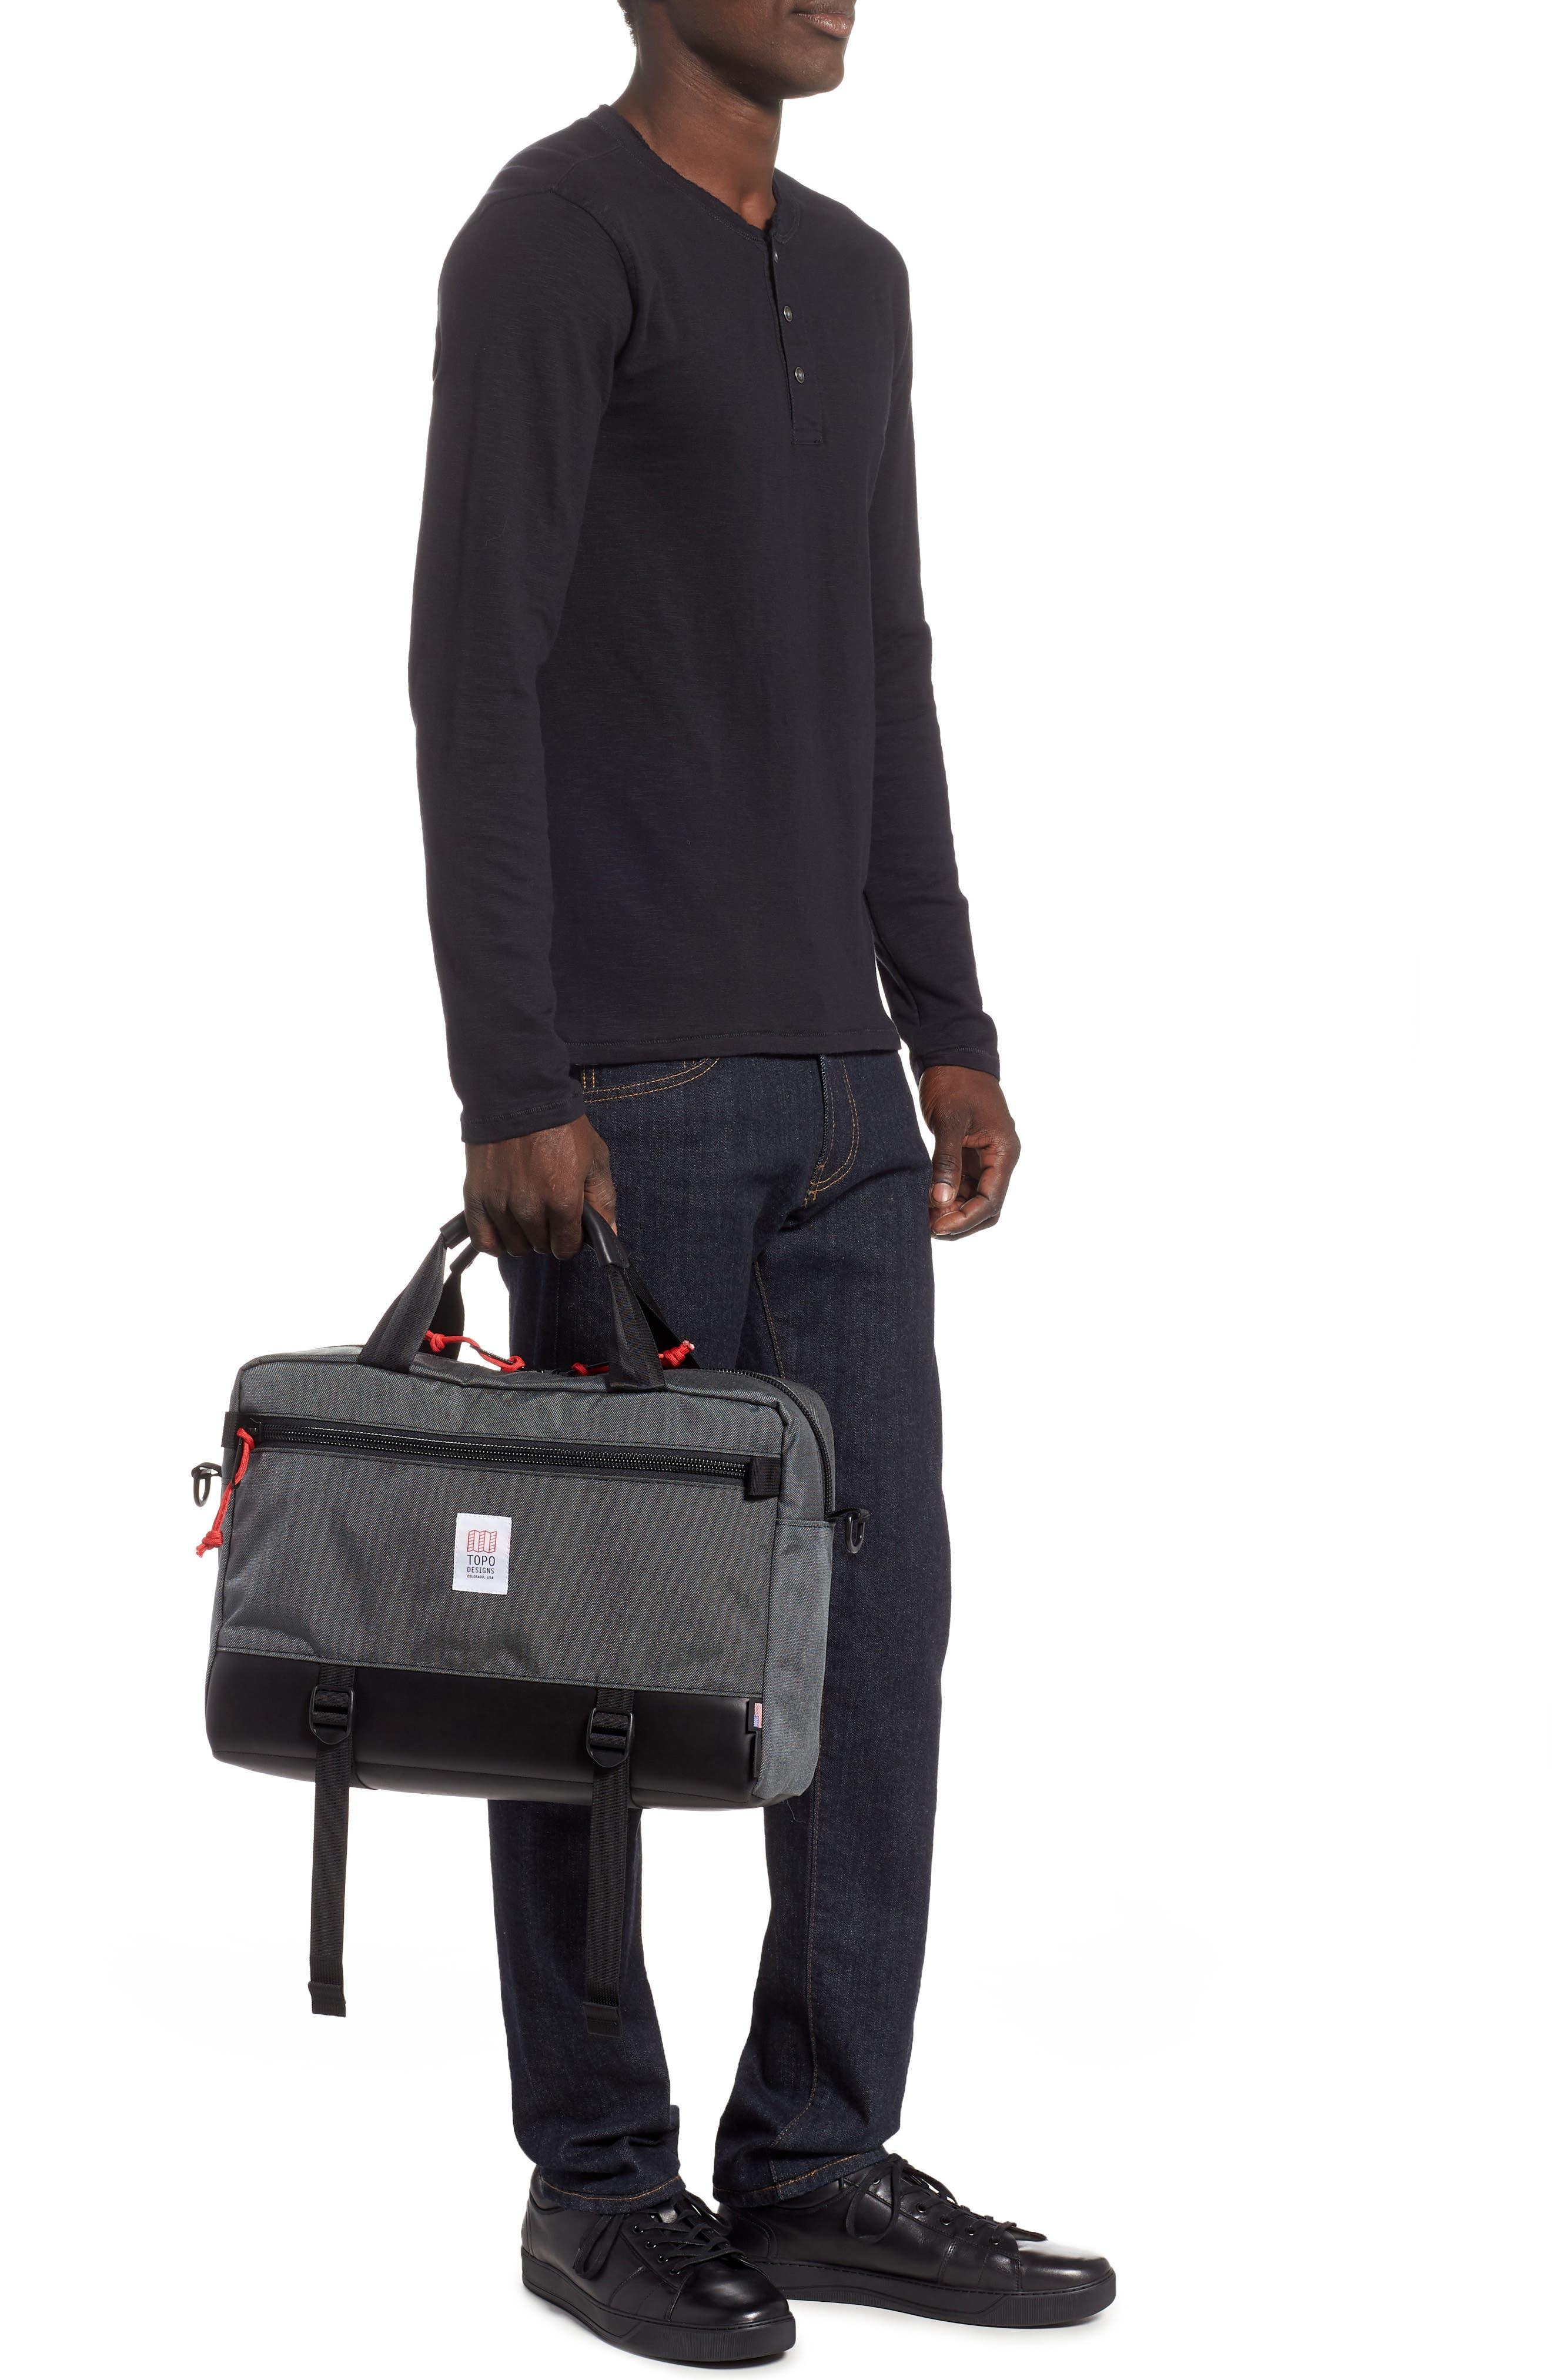 TOPO DESIGNS, 'Commuter' Briefcase, Alternate thumbnail 2, color, CHARCOAL/BLACK LEATHER